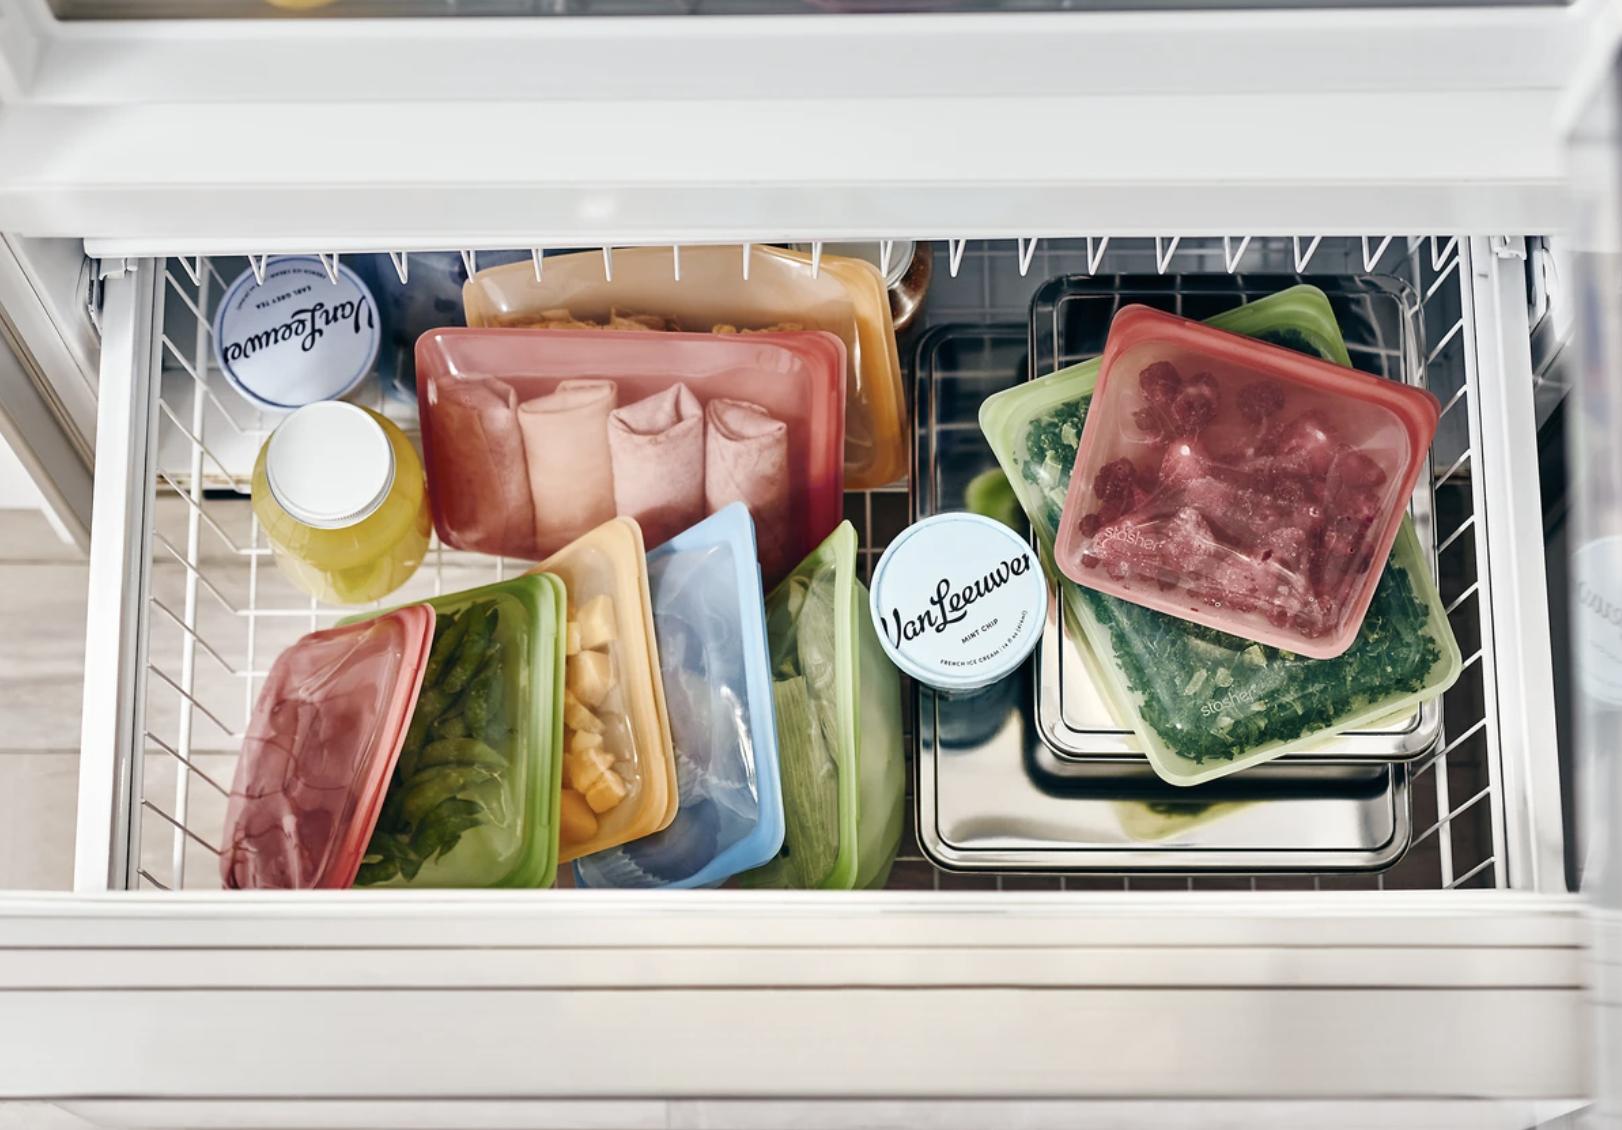 Stasher 100% Silicone Food Grade Reusable Storage Bag, (Bundle 4-Pack Small), $49.99 at Amazon